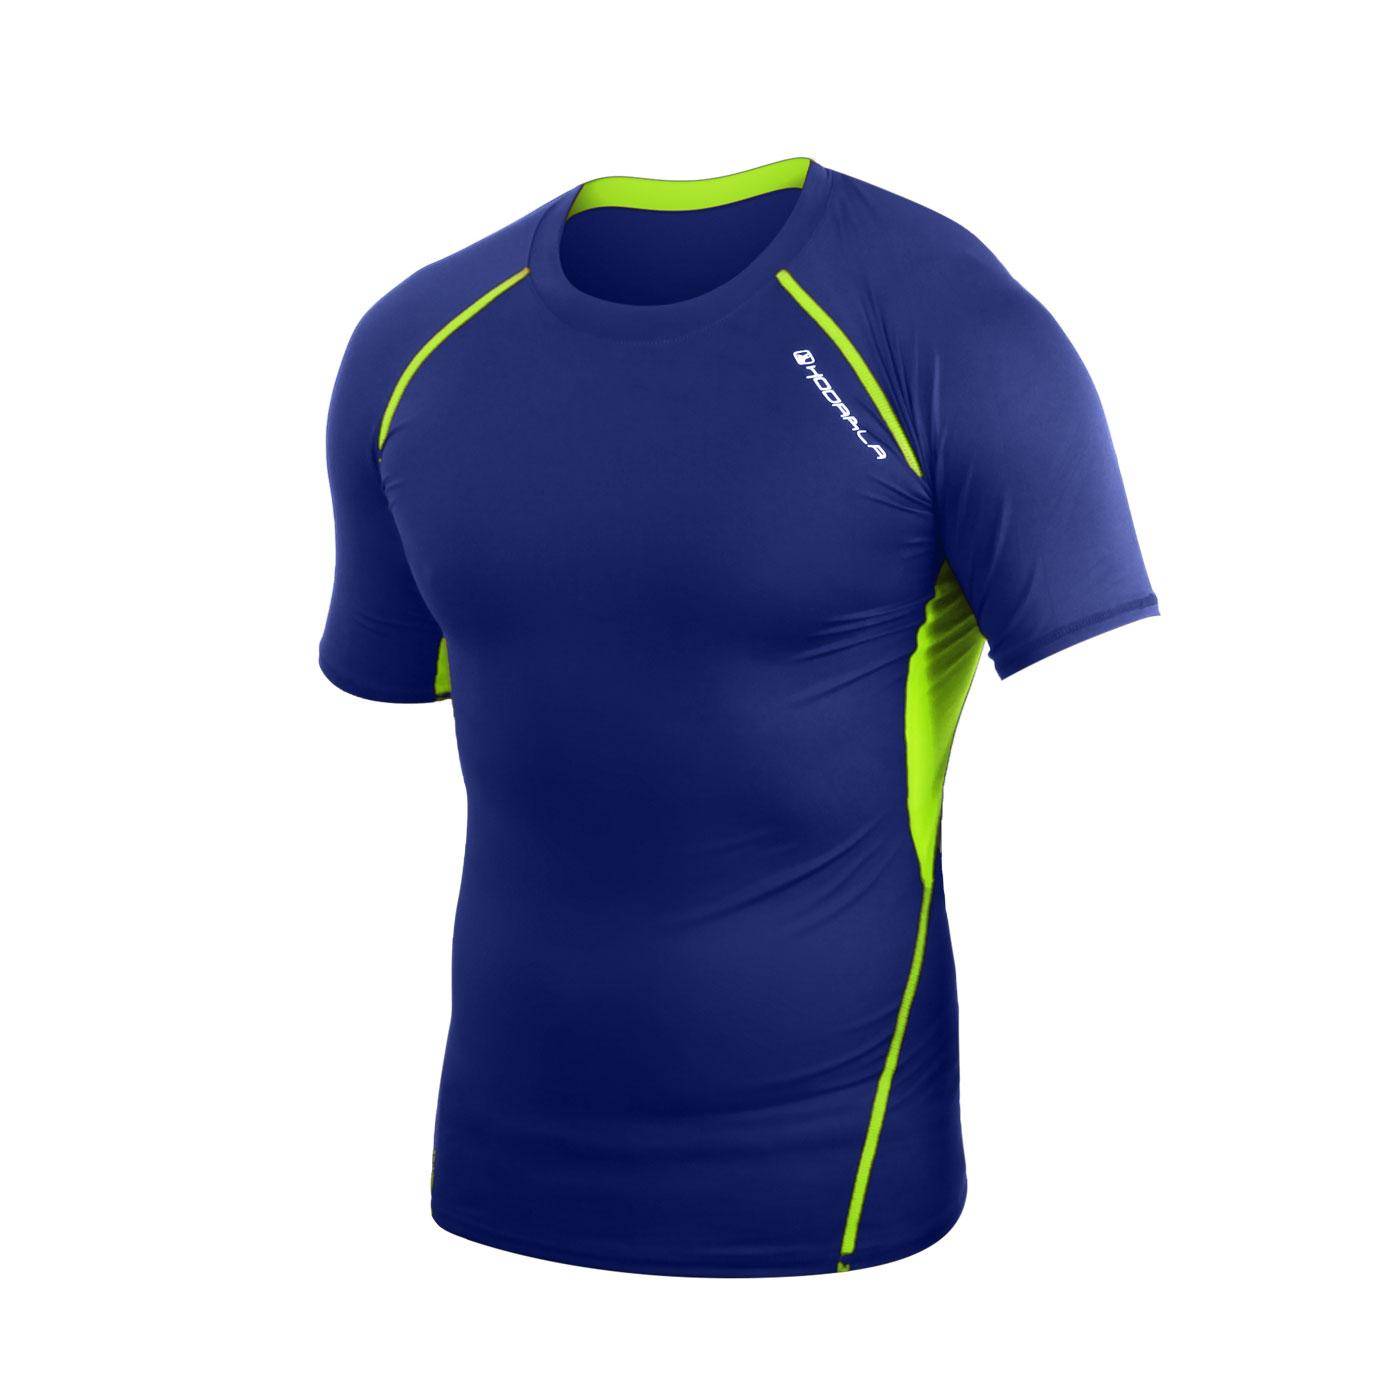 HODARLA 肌動圓領短袖緊身衣 3115501 - 藍螢光黃